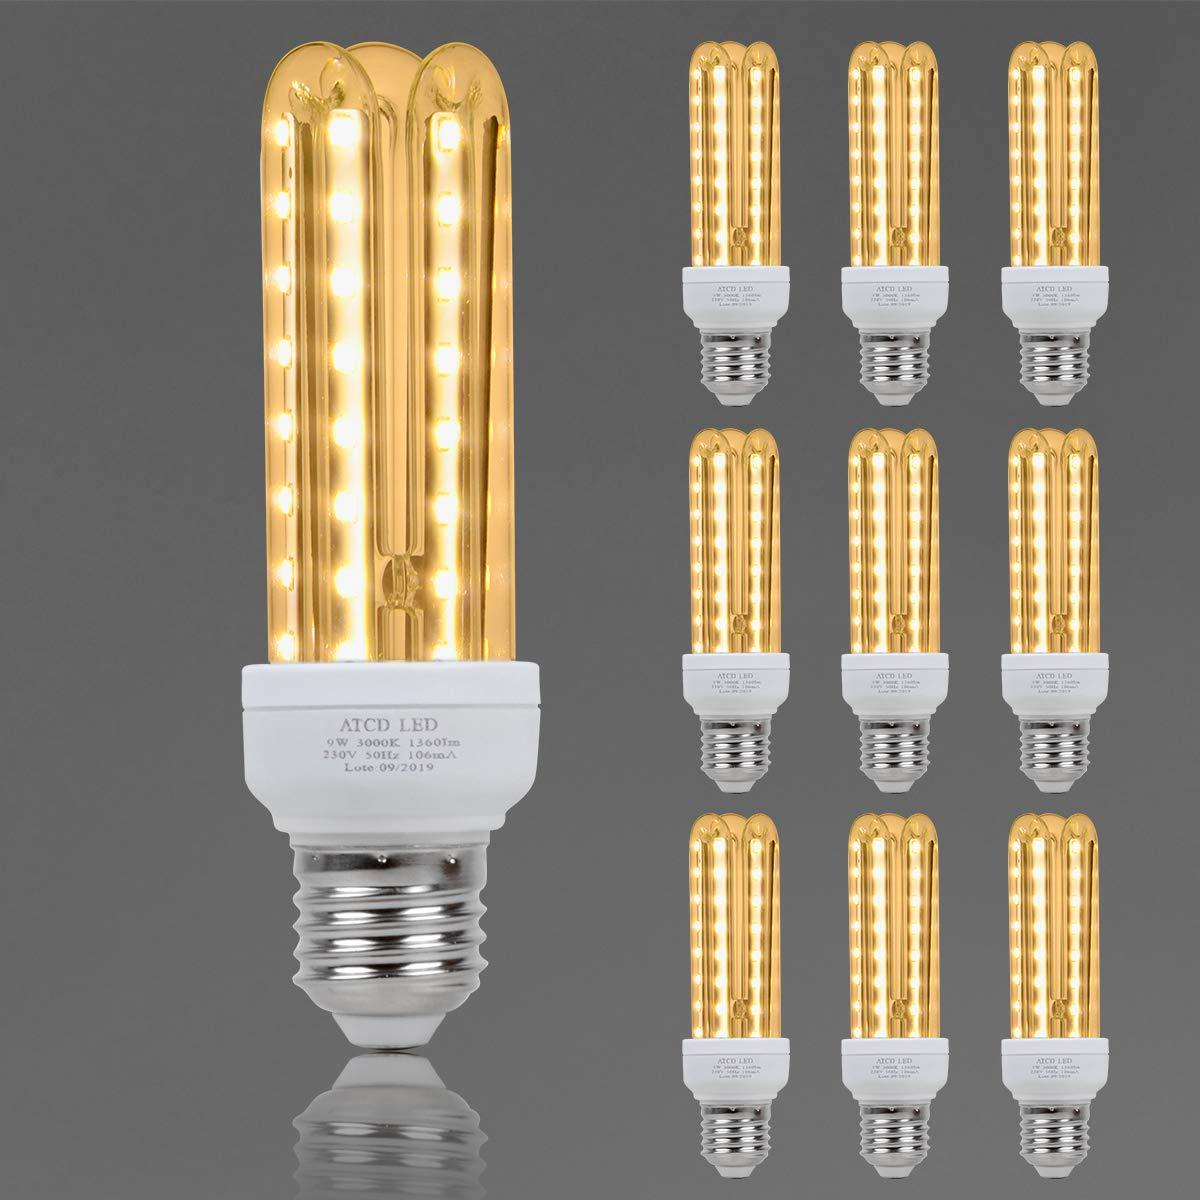 Bombilla LED, ATCD Bombillas Led e27 Luz Calida, Bombilla Led Estándar e27 3U, 9 W Equivalente